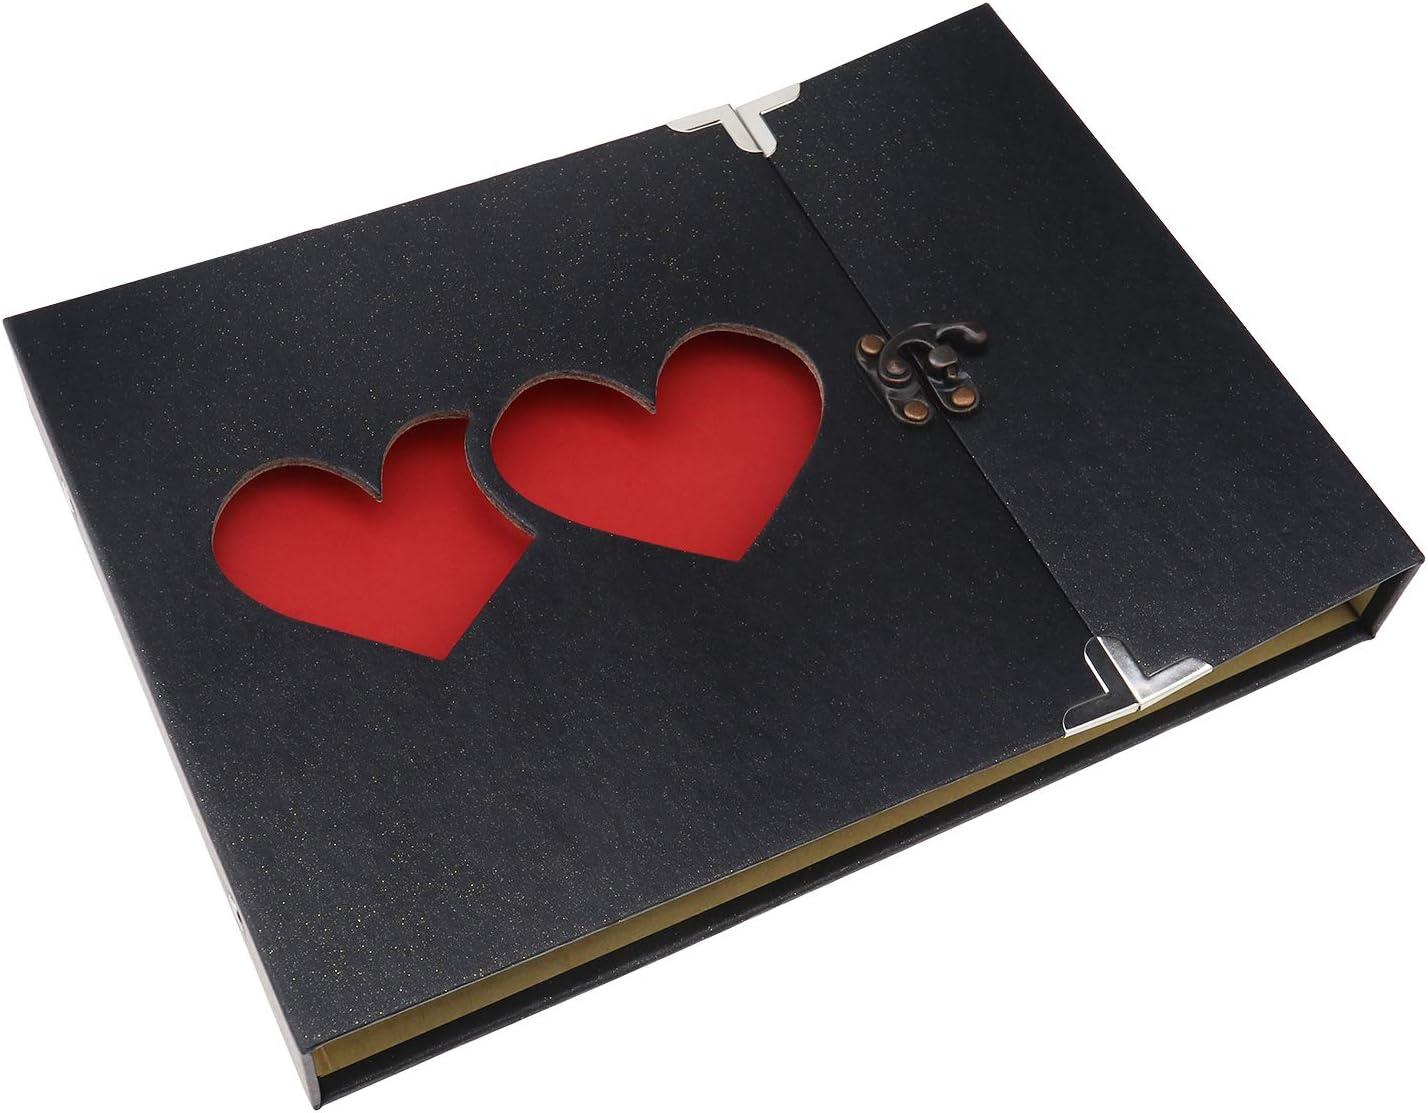 SING F LTD Black Double-Heart Handmade DIY Family Album with Bonus Gift Box for Christmas Valentine's Day Birthday